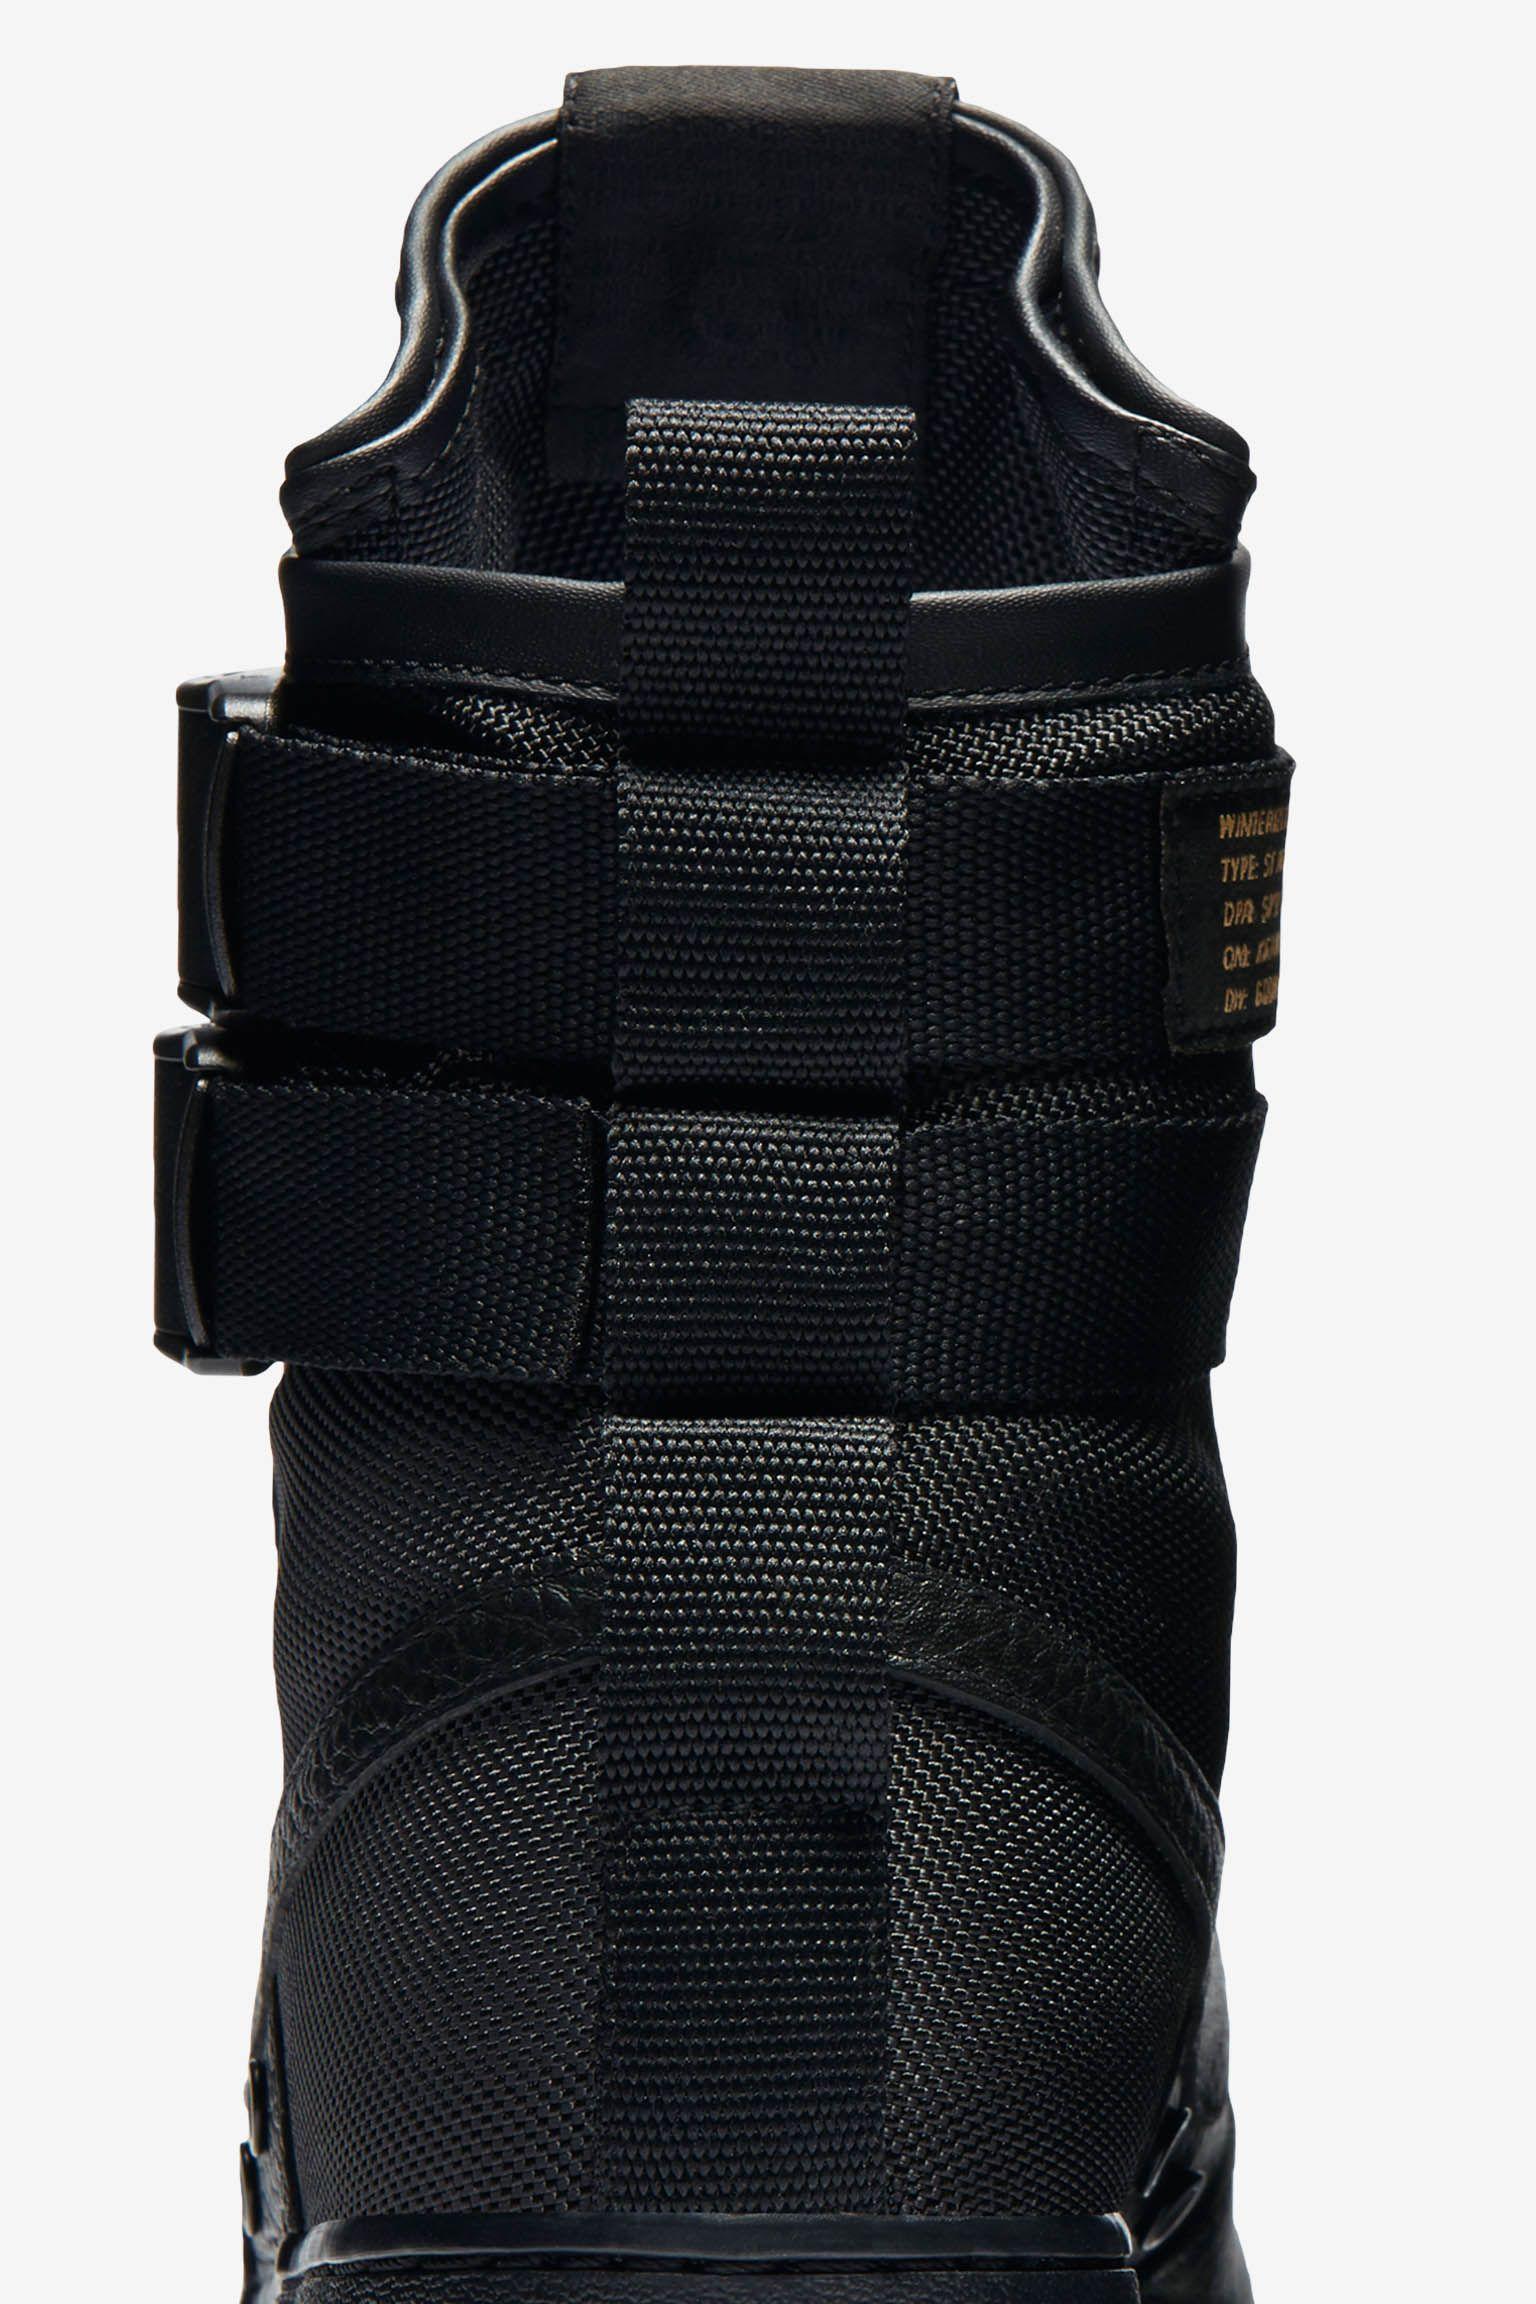 Nike SF AF-1 'Black & Gum'